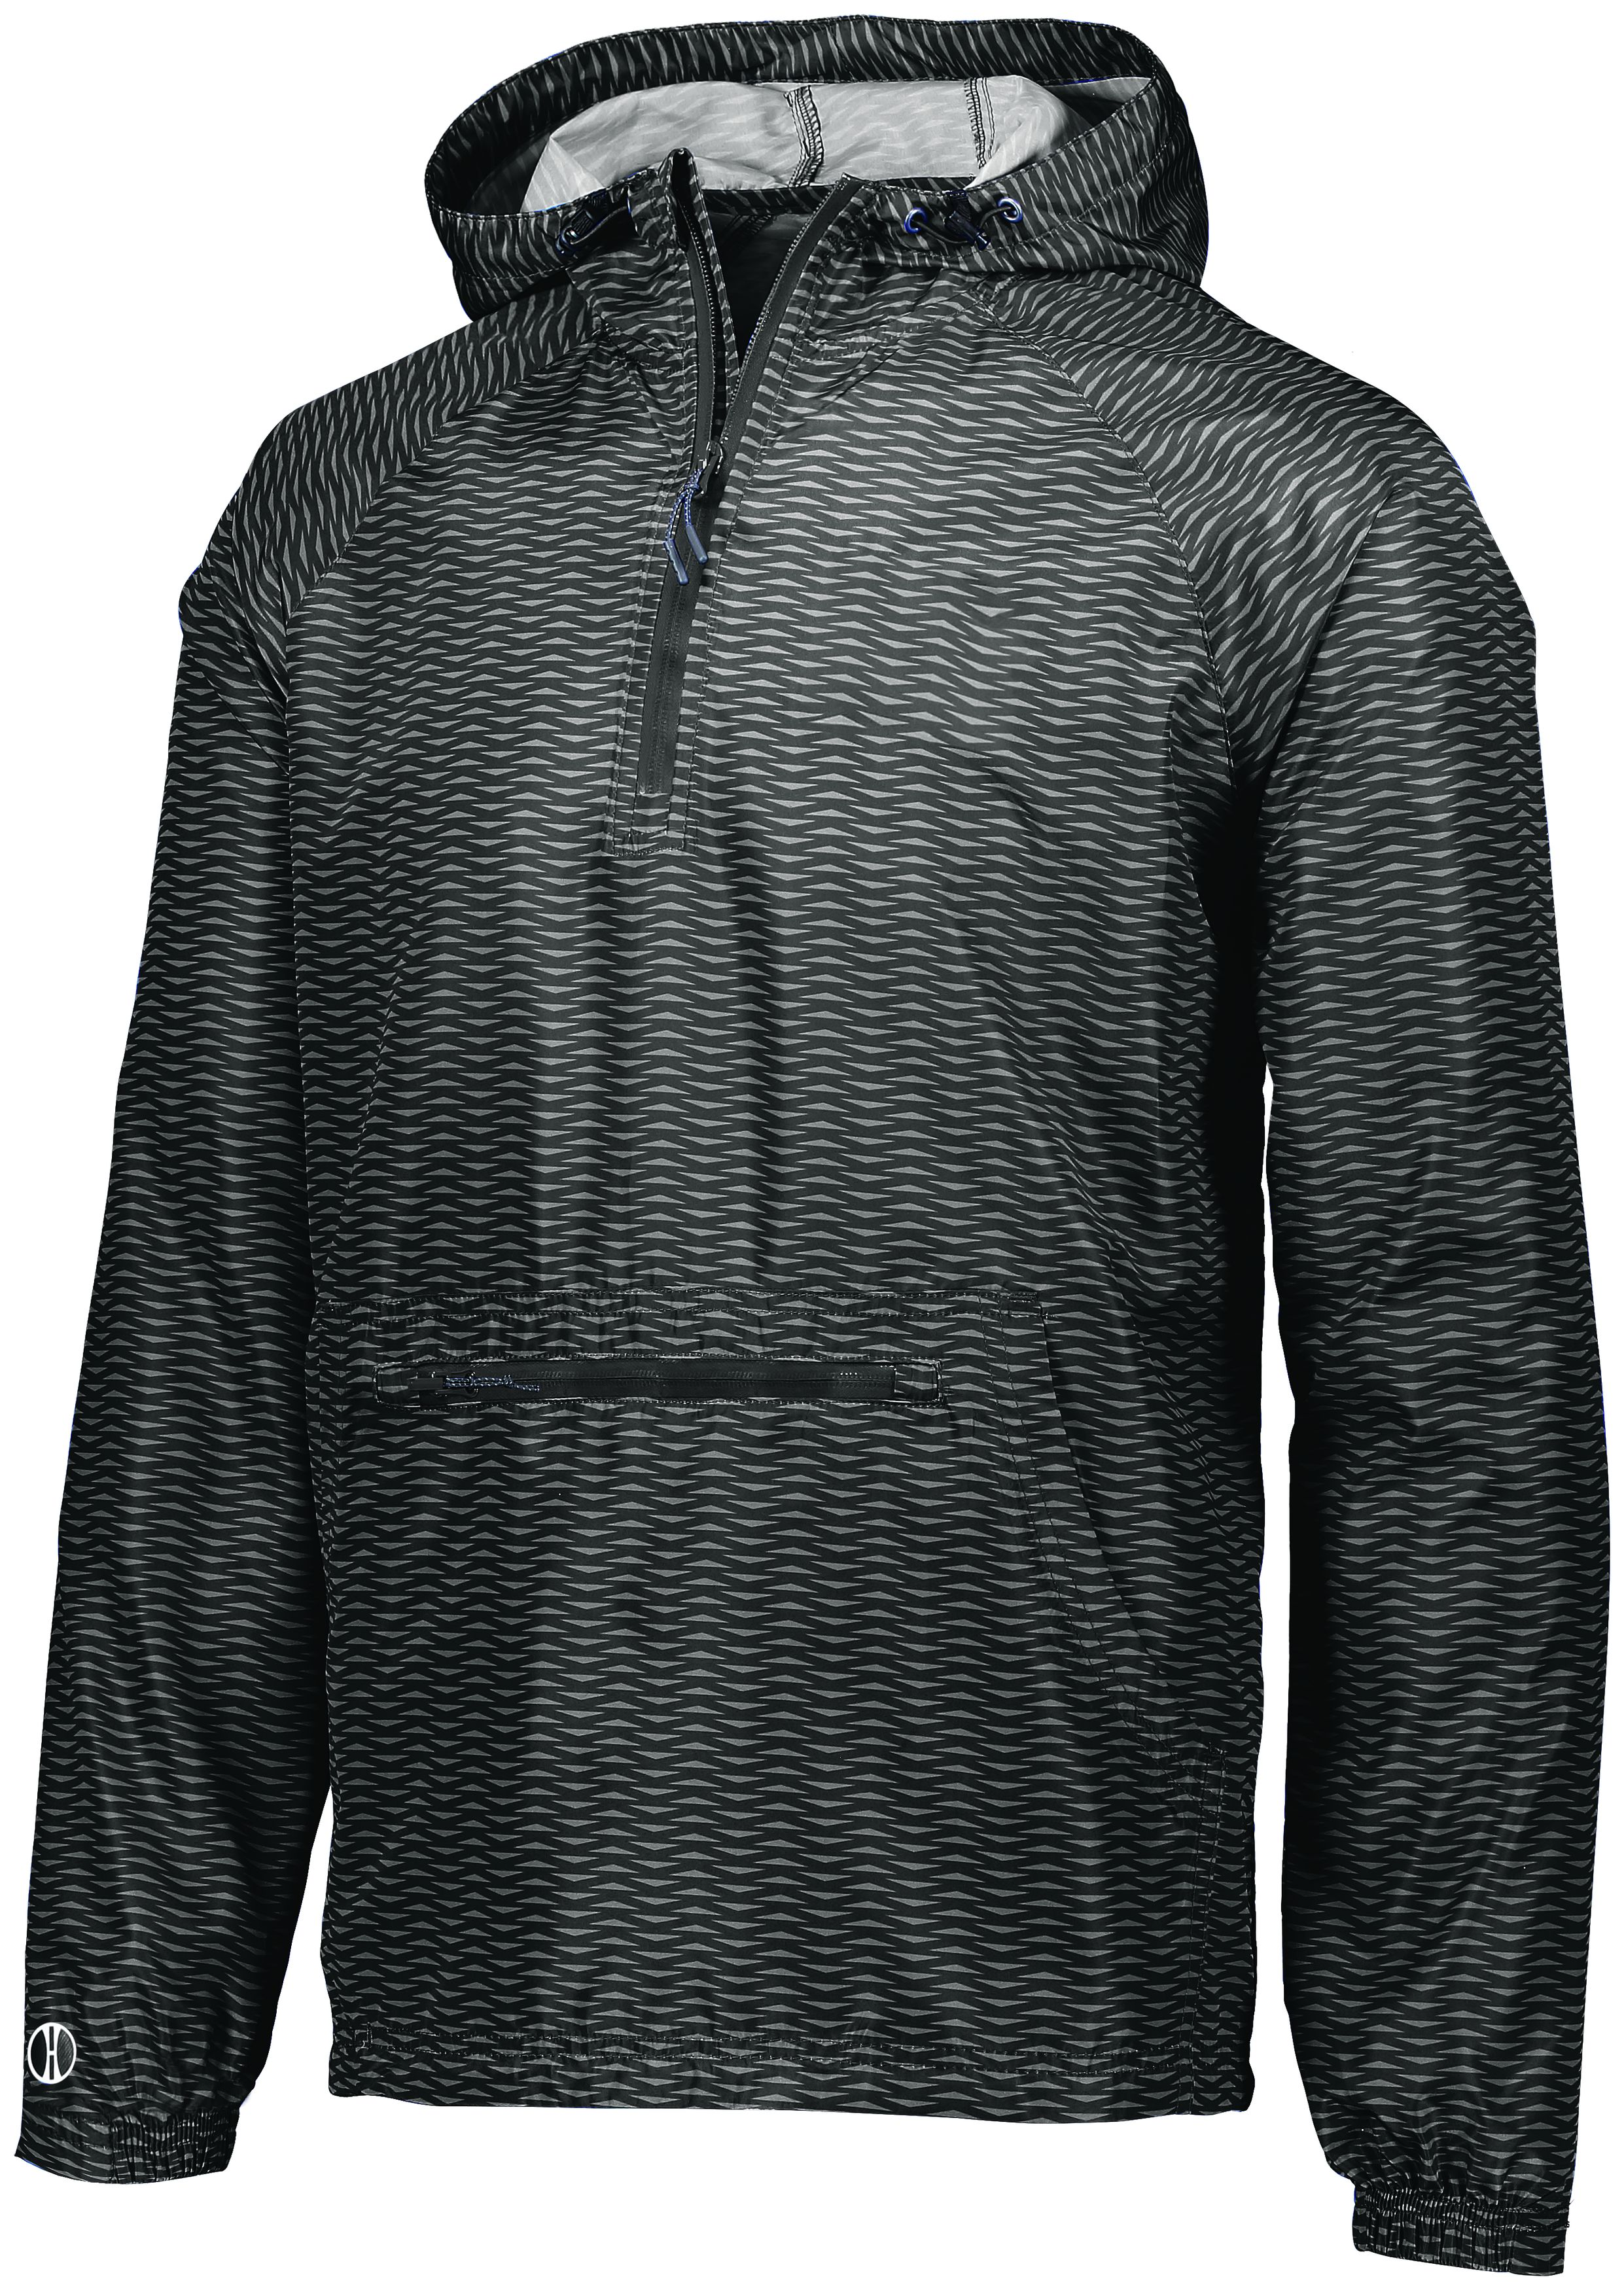 Range Packable Pullover - BLACK